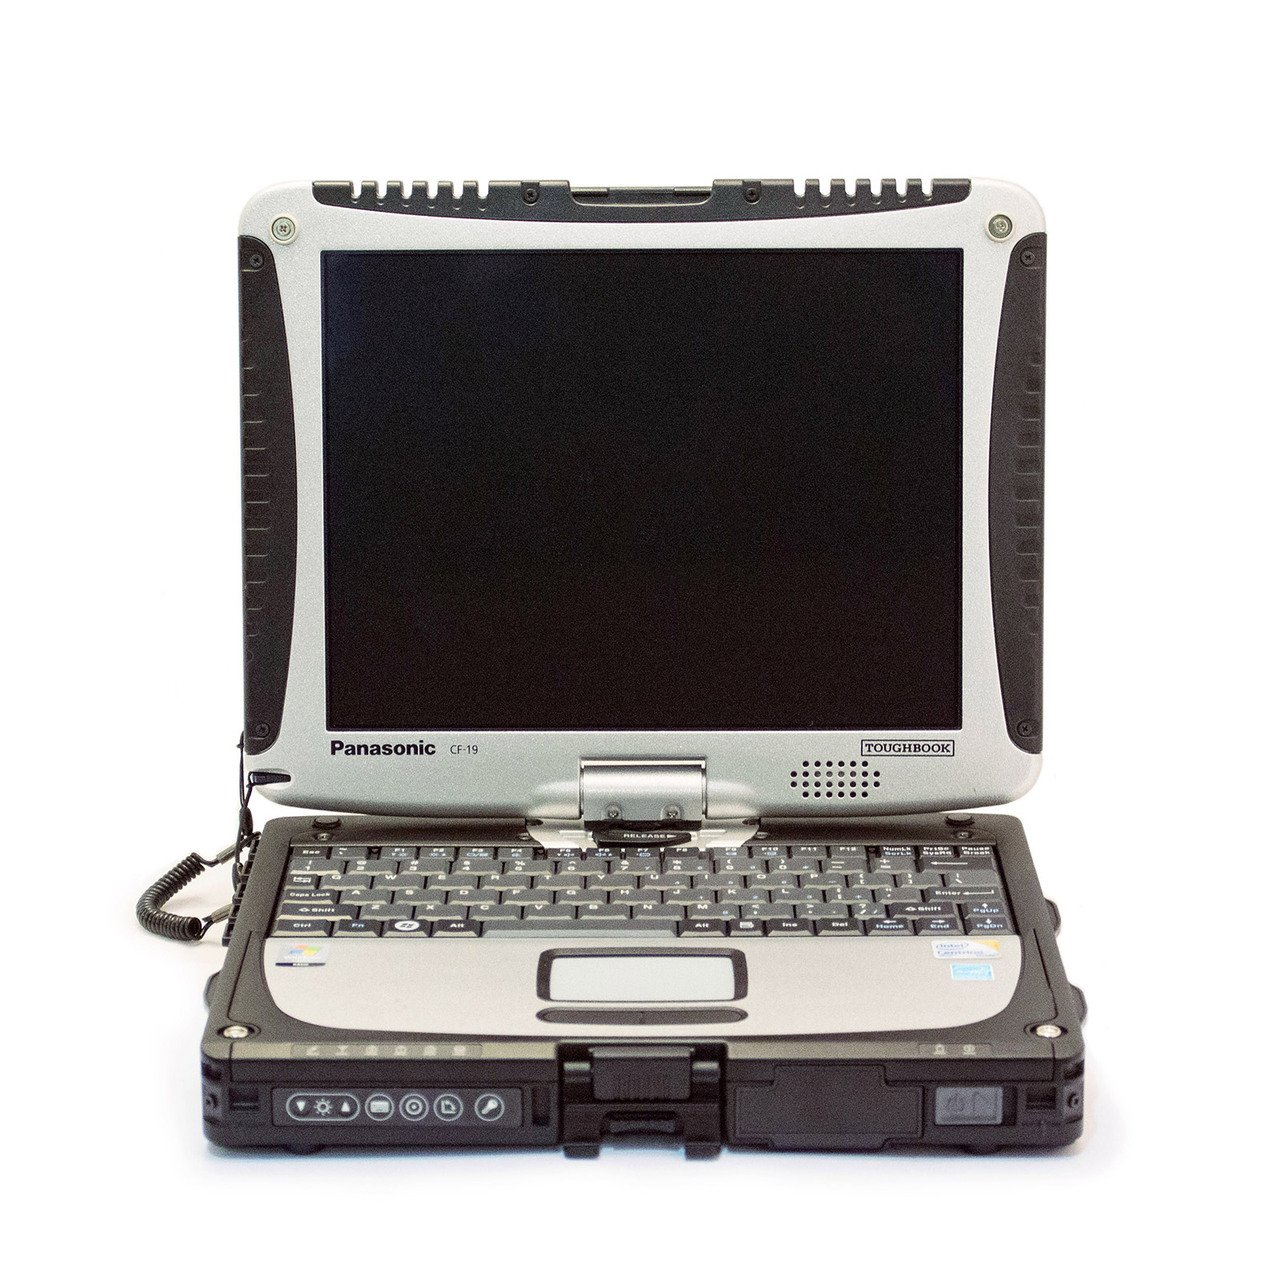 "Laptop Panasonic Toughbook CF-19 MK3, Intel Core 2 Duo SU9300 1.2 GHz, WI-FI, Bluetooth, Display 10,4"" 1024 by 768 Touchscreen, 2 GB DDR2, 250 GB SSD SATA, Second Hand - imaginea 1"